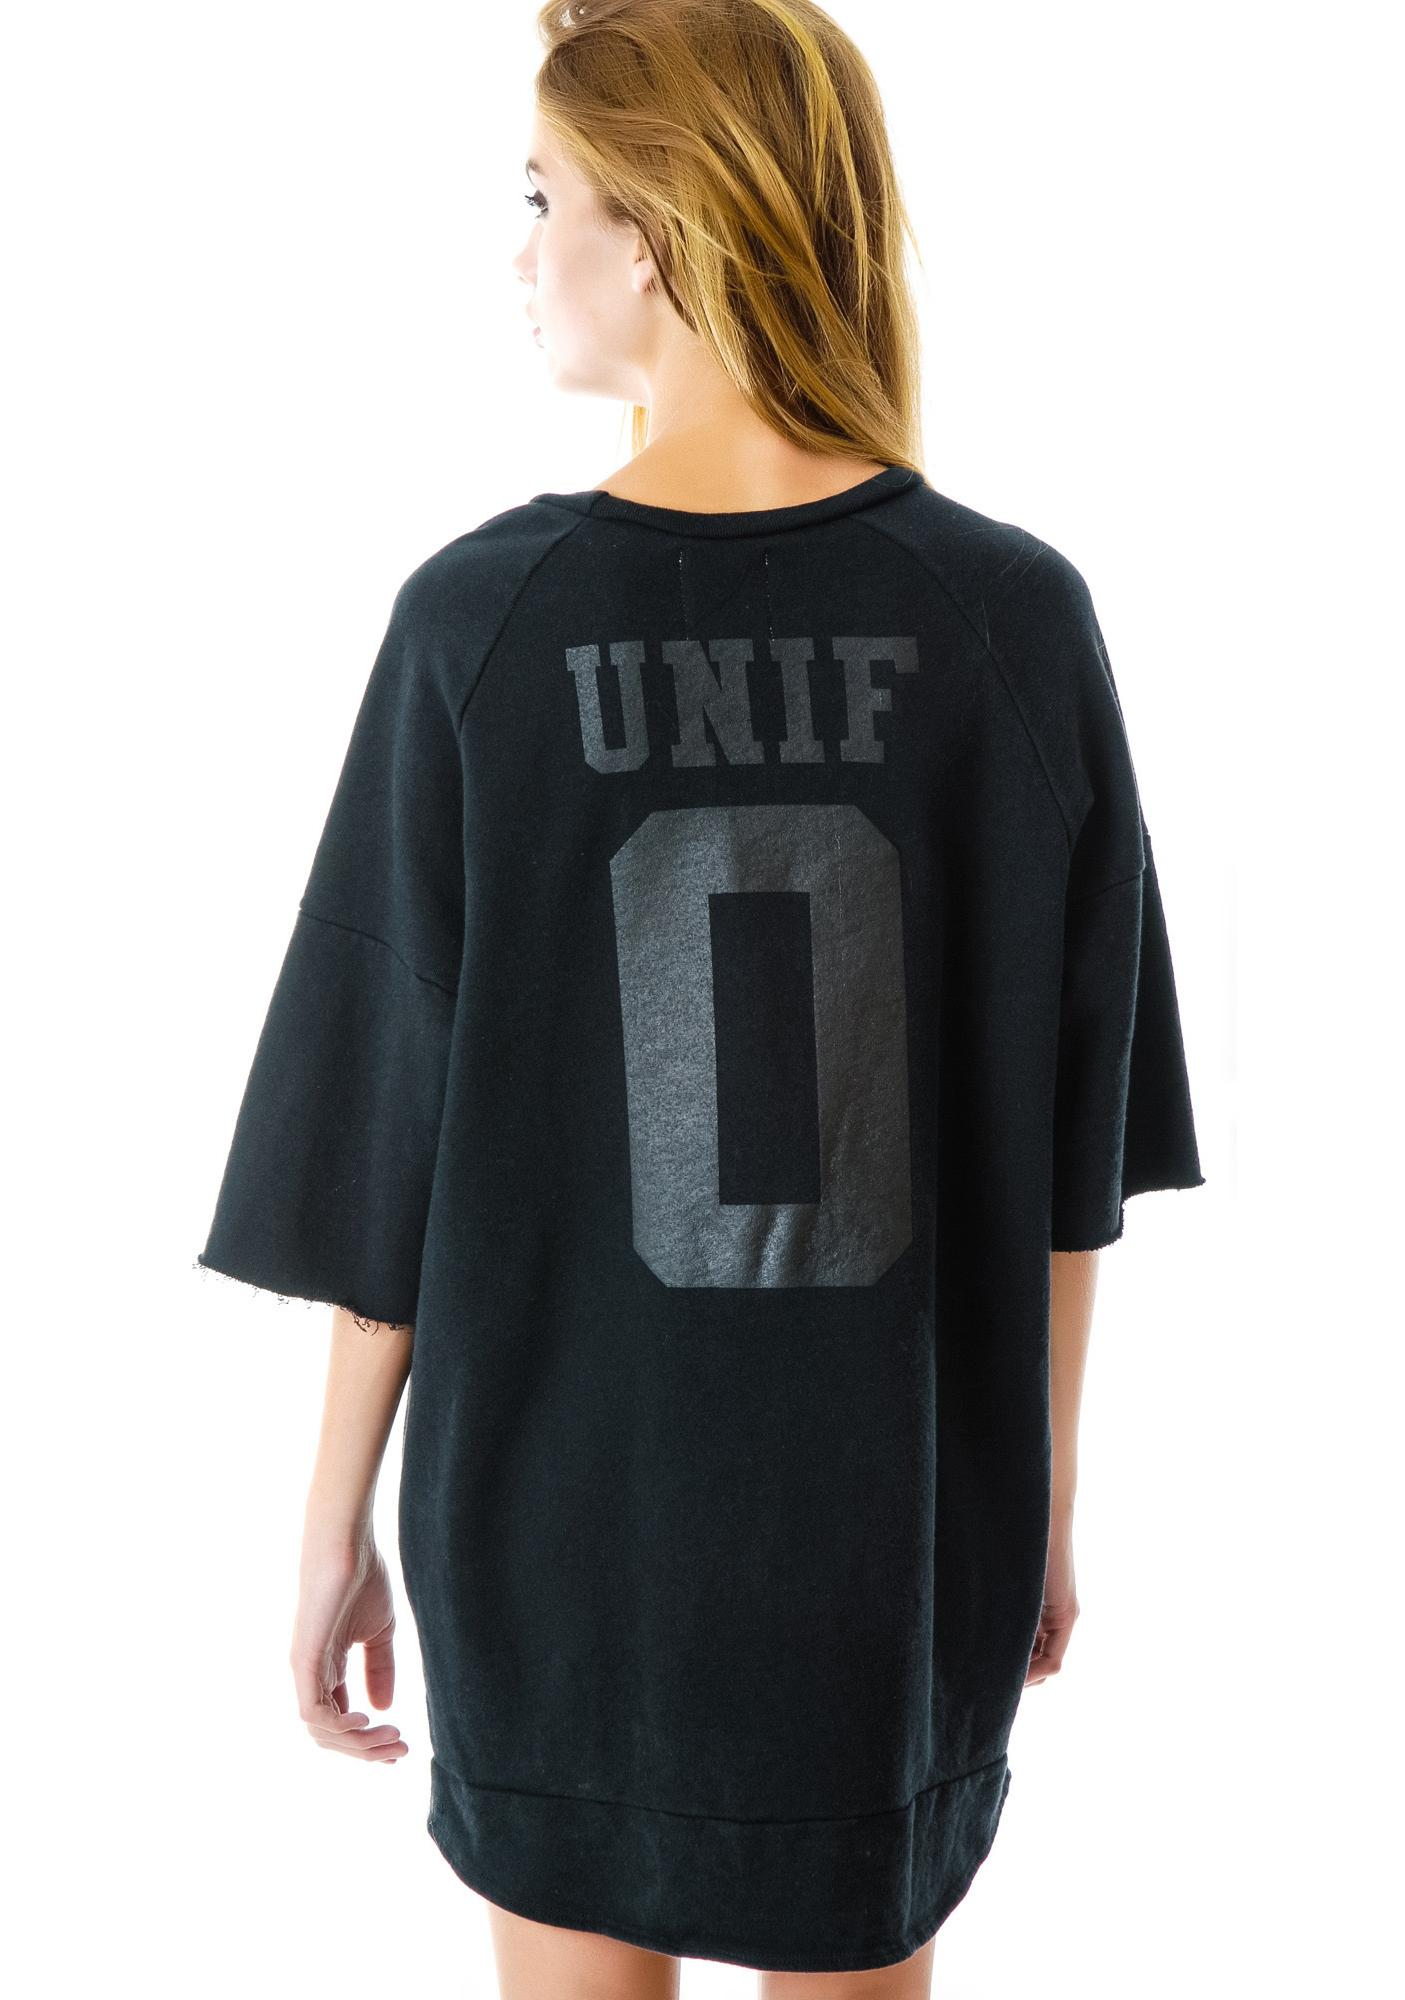 UNIF Less Than 0 Sweatshirt